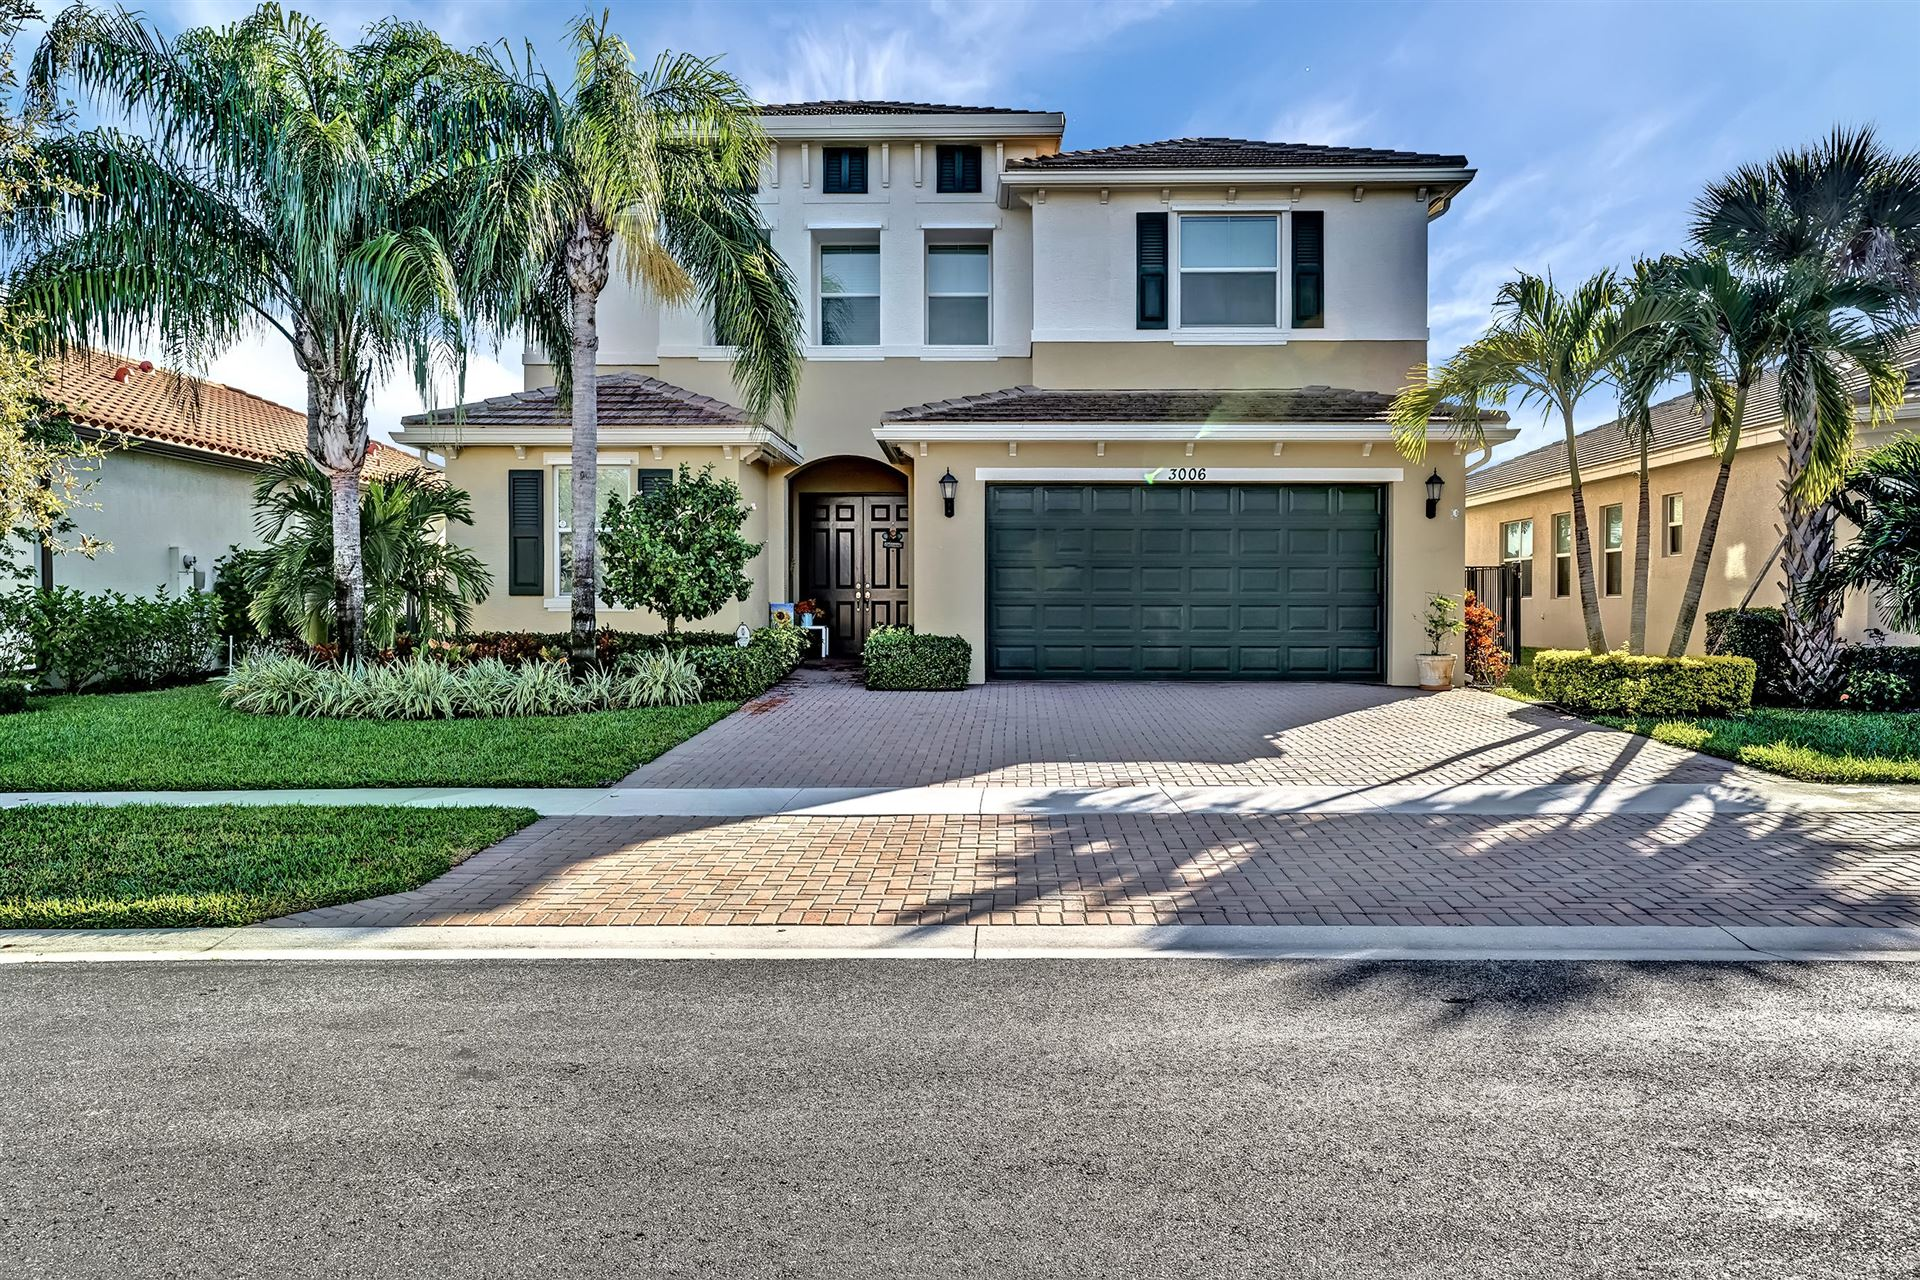 3006 Strada Court, Royal Palm Beach, FL 33411 - #: RX-10599193